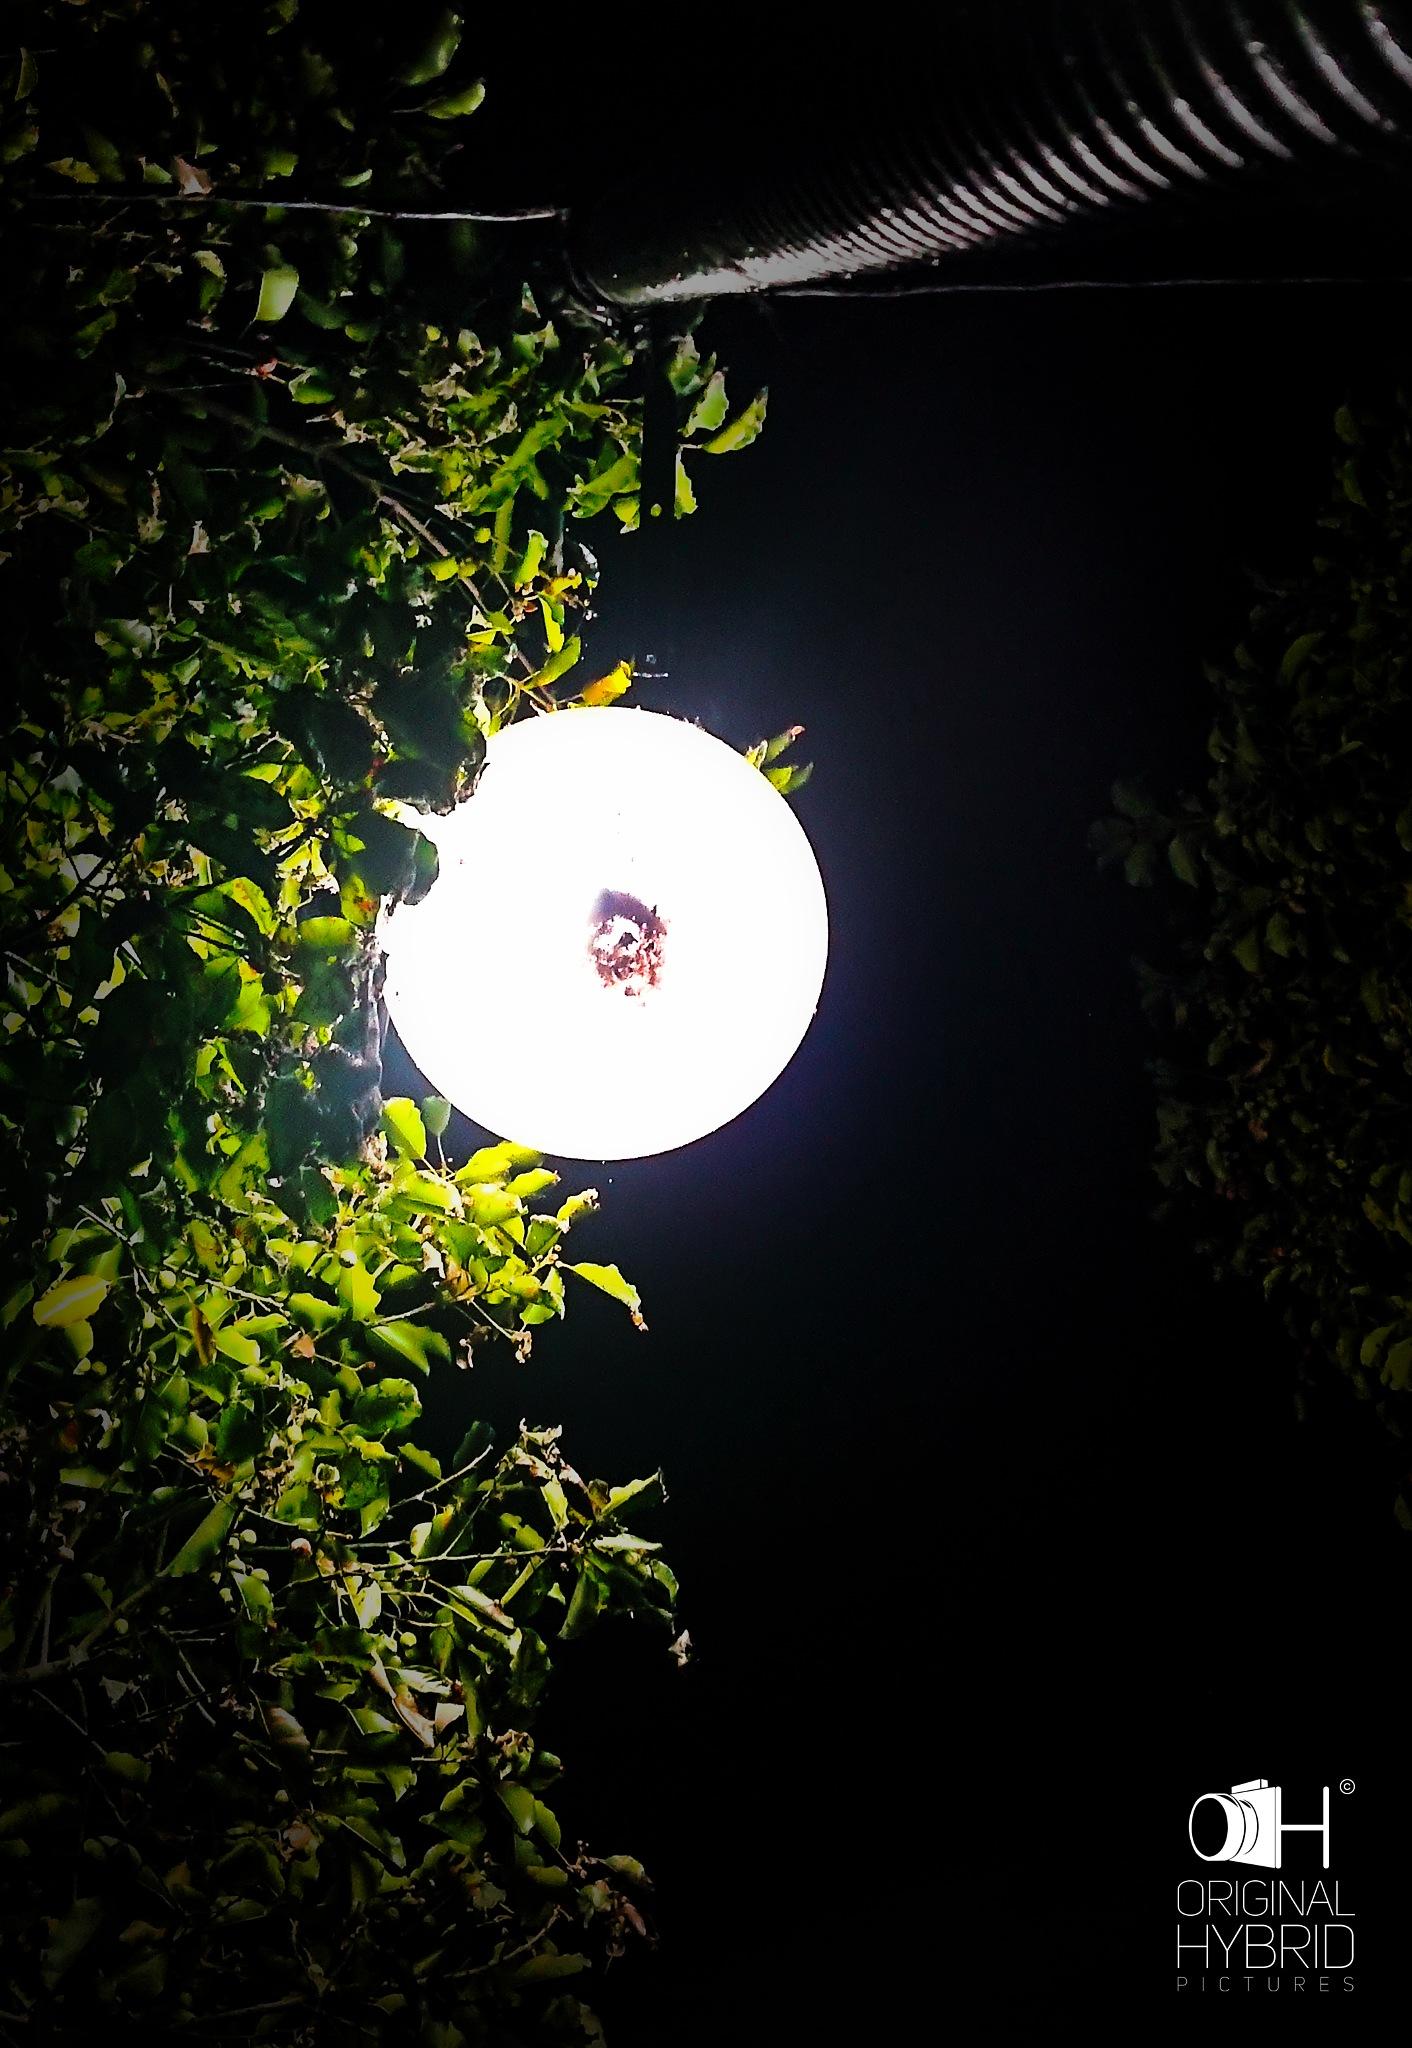 LIGHTS by Himanshu Lal